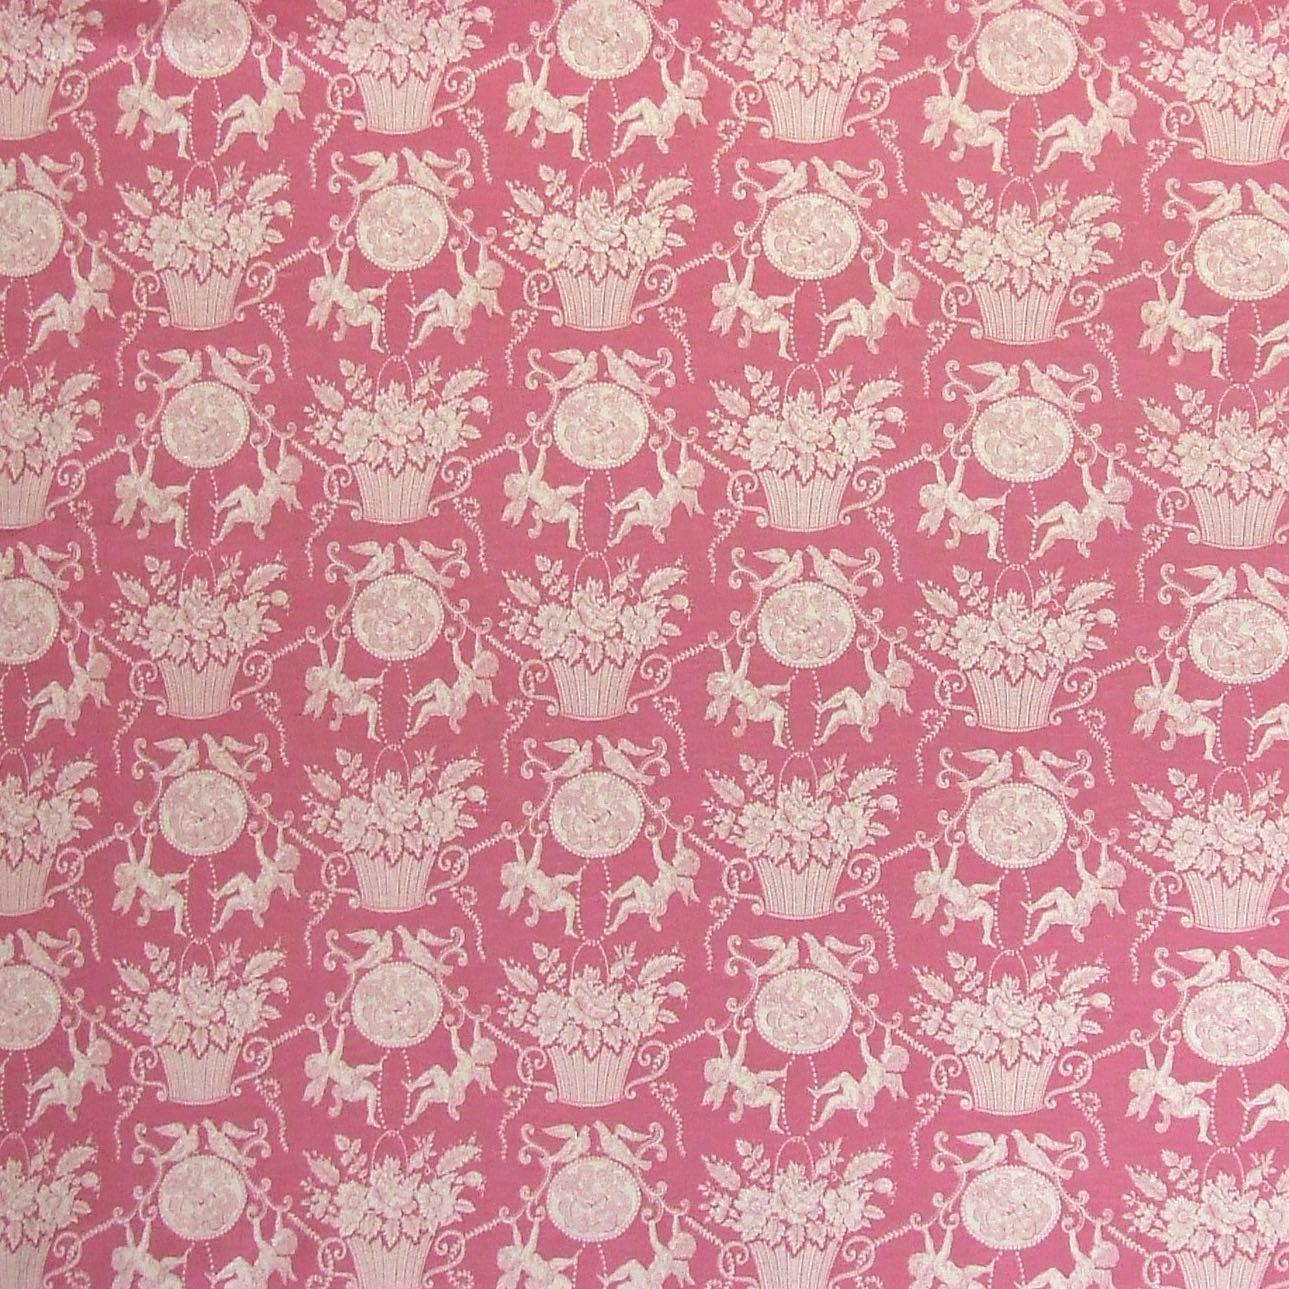 Charles Burger (シャール・ブルジェ) インテリアファブリック コットンリネンプリント 智天使 ピンク - 1423-002